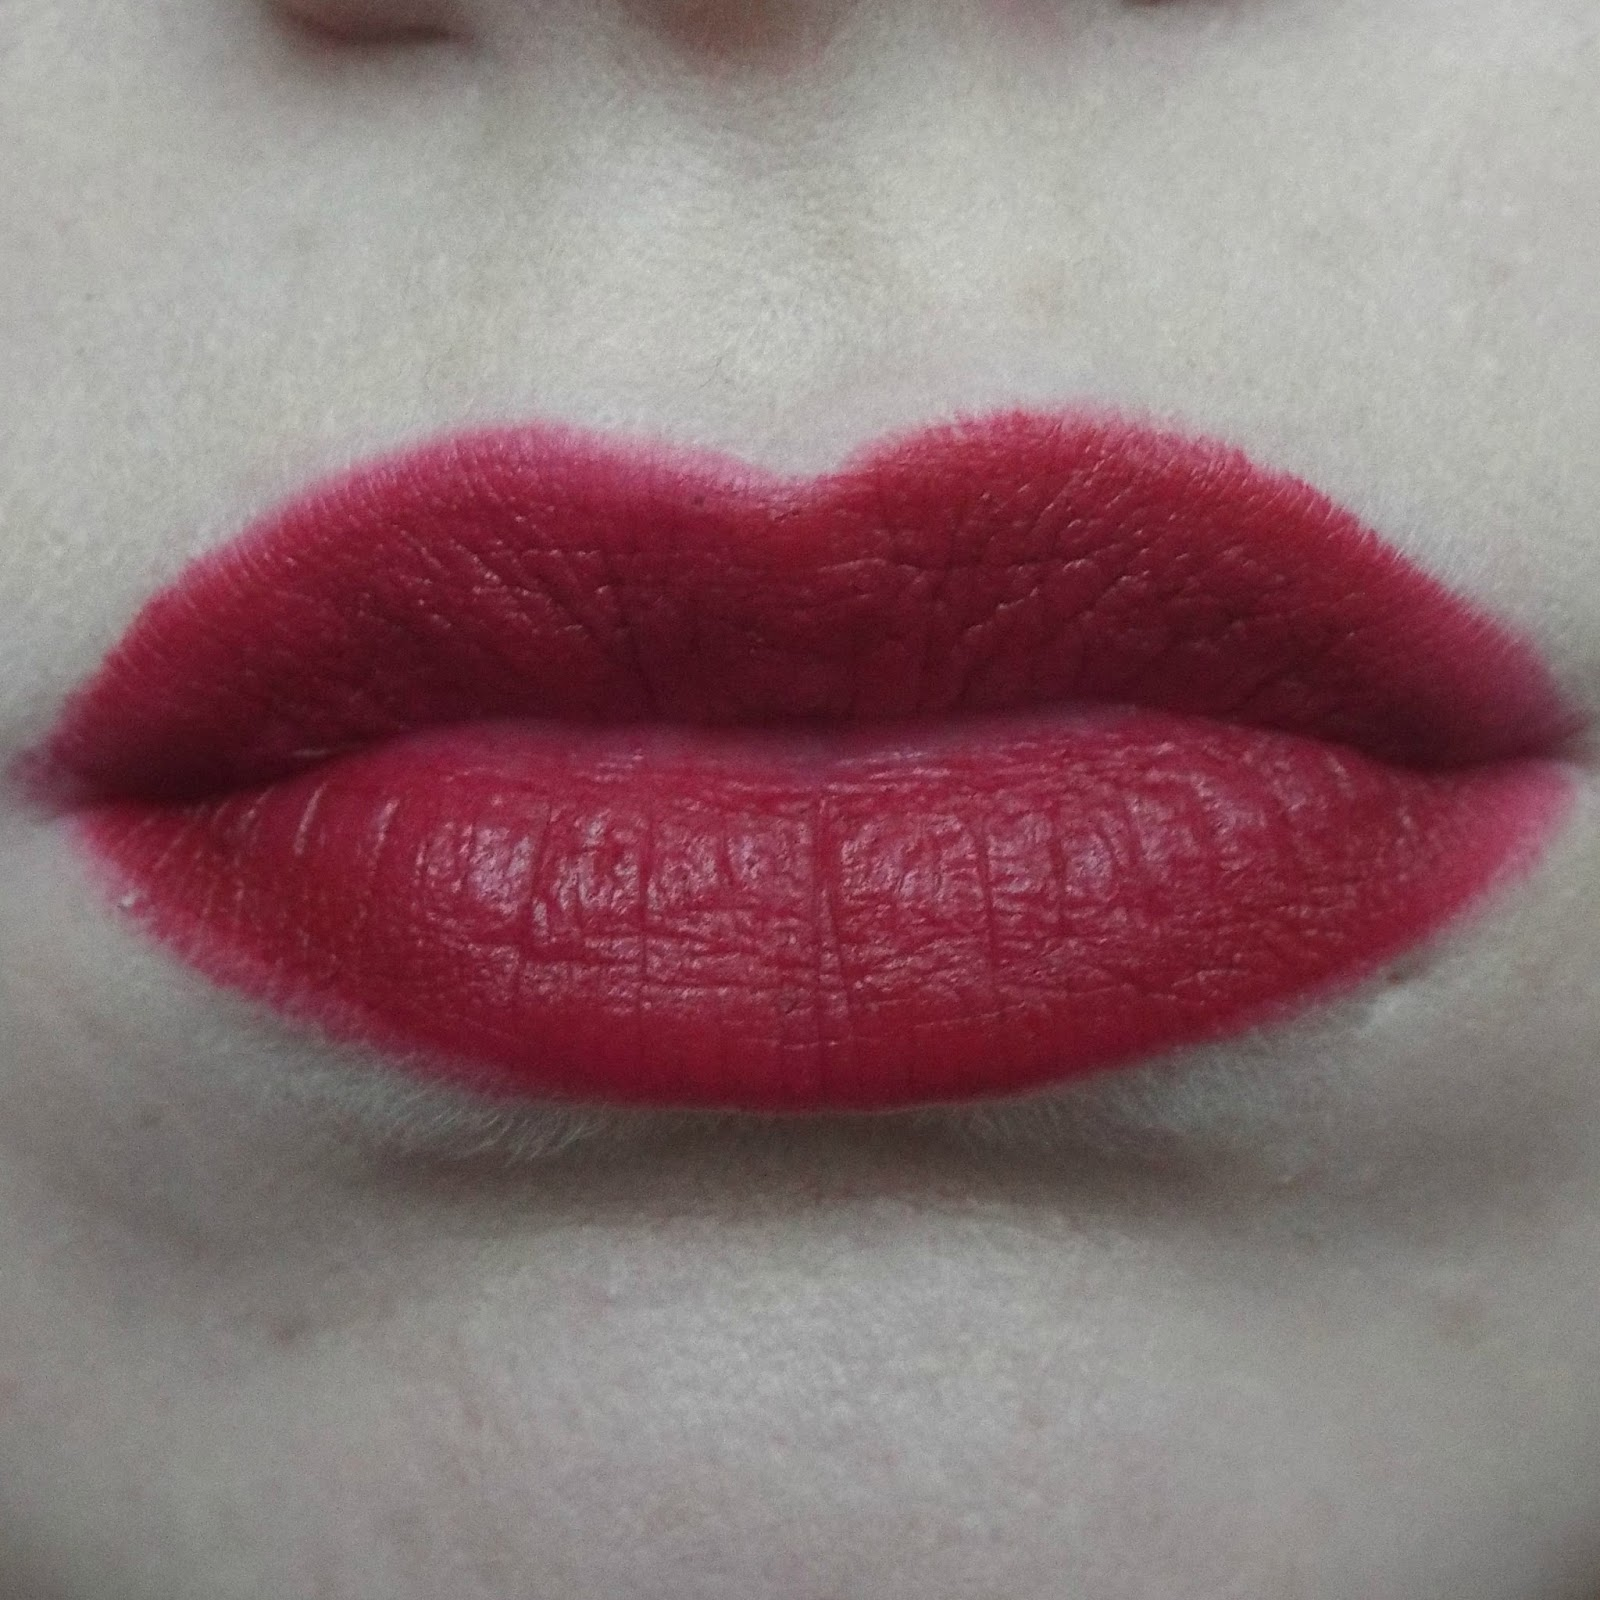 MAC Salon Rouge